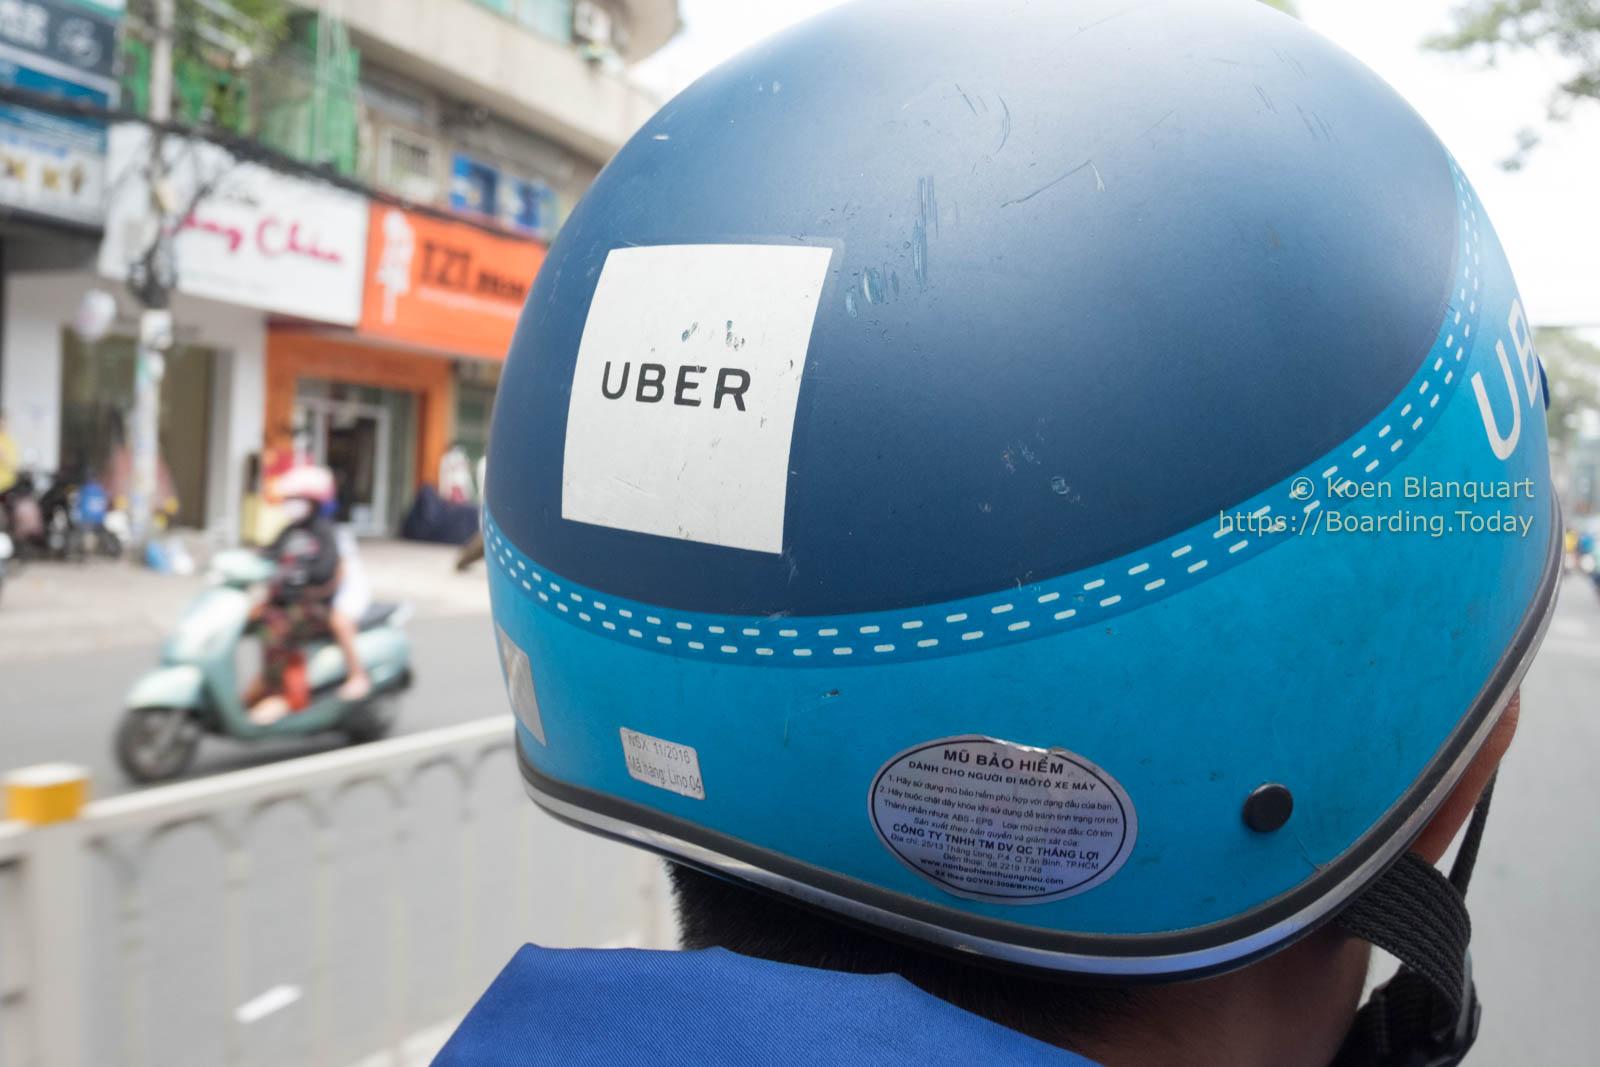 20170120-DSCF5341Ho Chi Minh City, Motor taxi, Saigon, Saigon_Food_Tour, Uber, Vietnam by Koen Blanquart for Boarding.Today.jpg